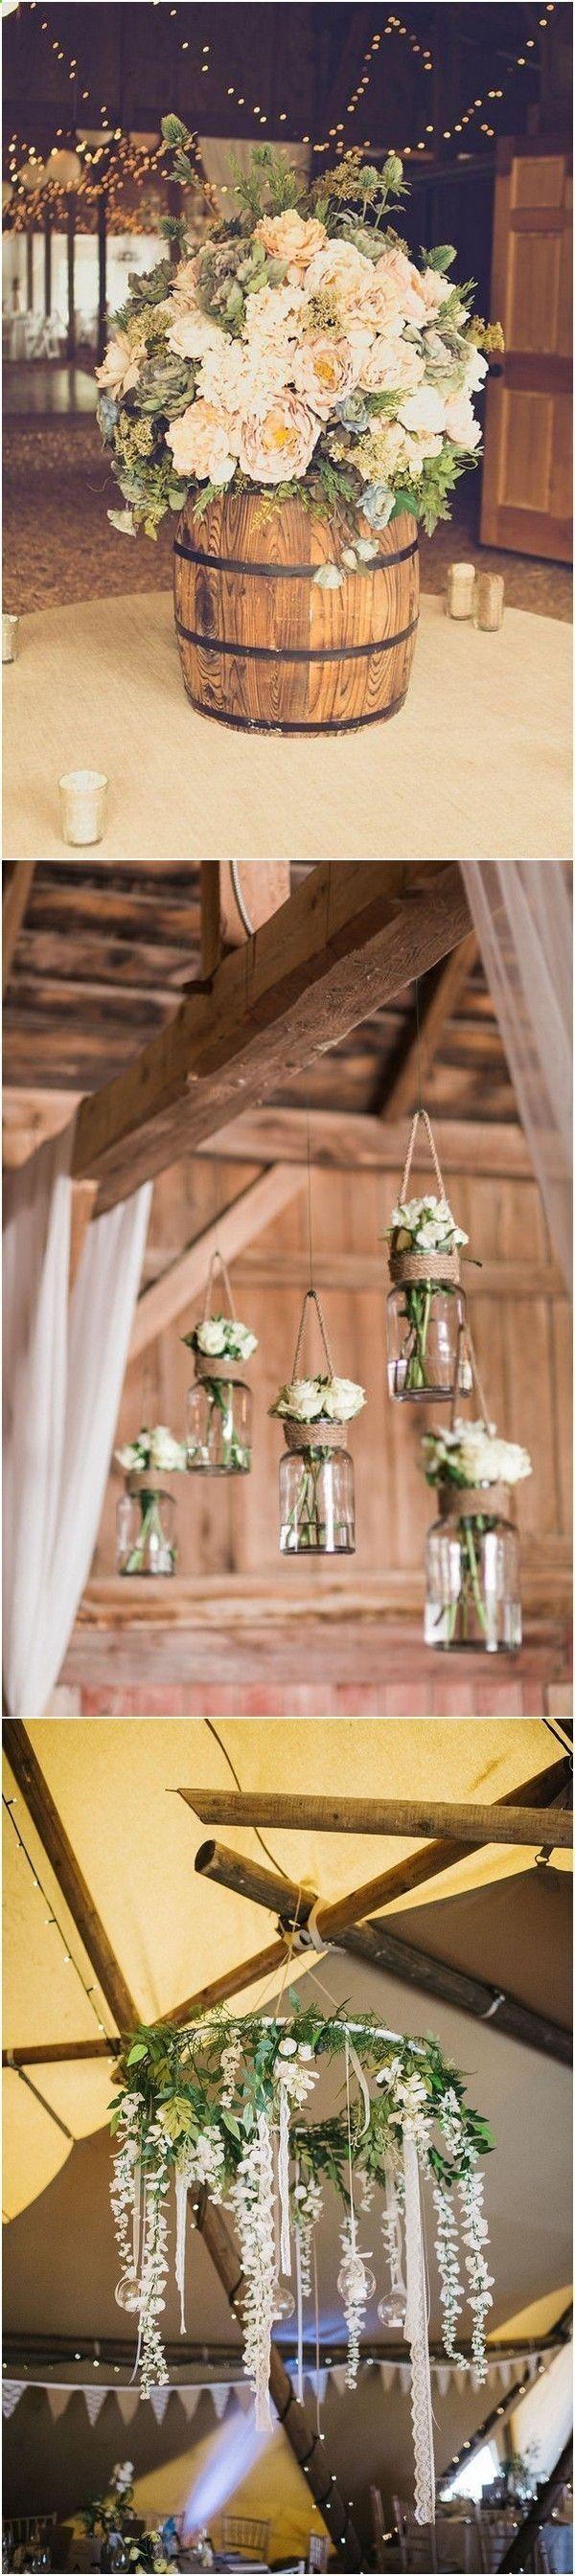 Home wedding decor ideas  country rustic barn wedding decoration ideas  Home Jobs  Pinterest